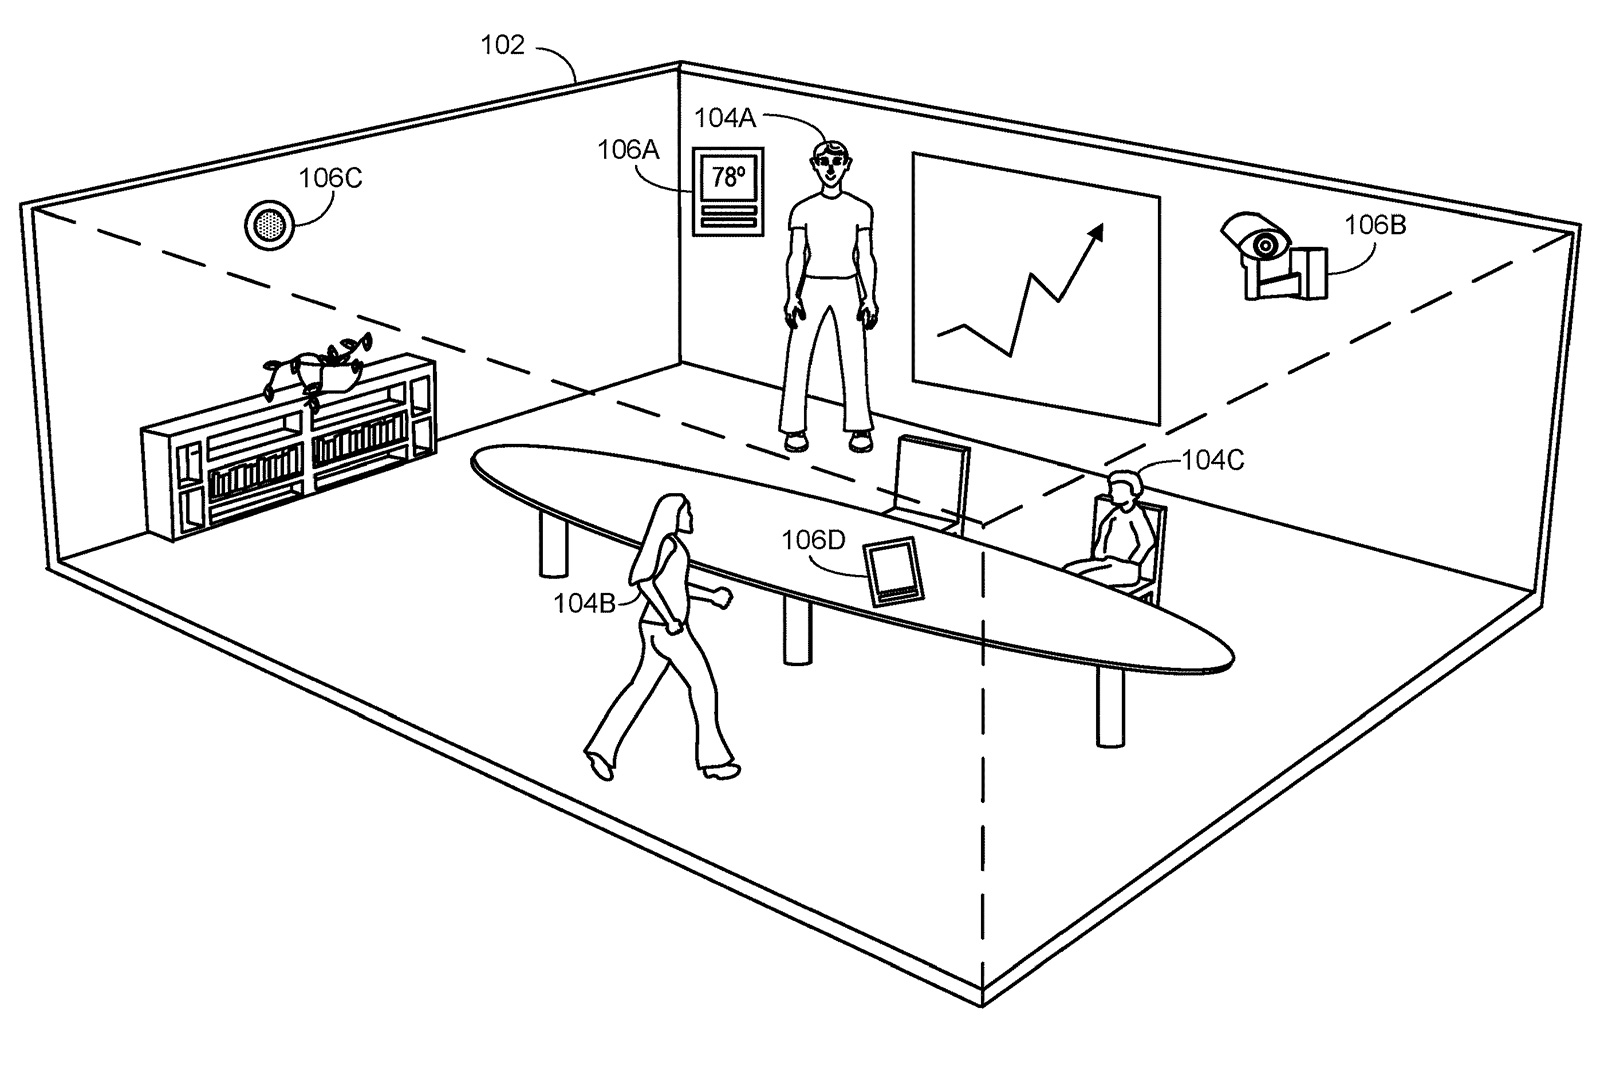 Microsoft envisions 'scoring' meetings based on body language